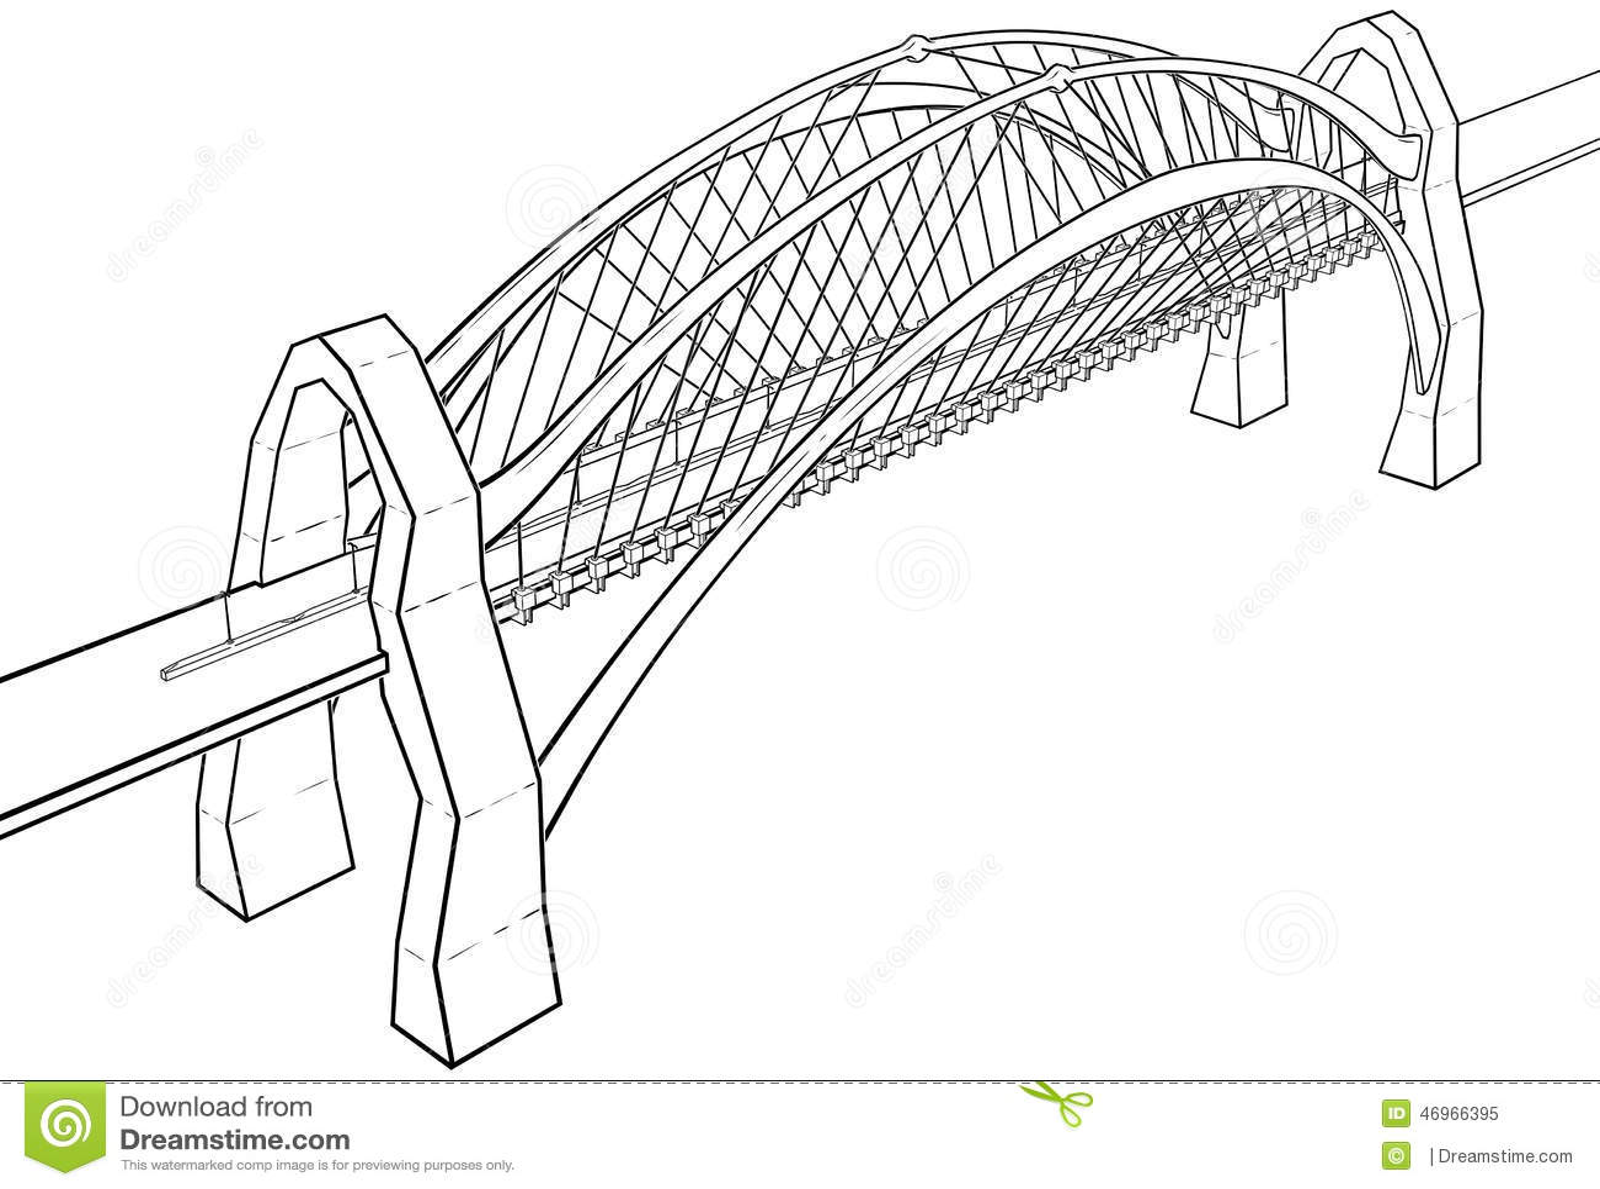 bridge illustration stock illustration